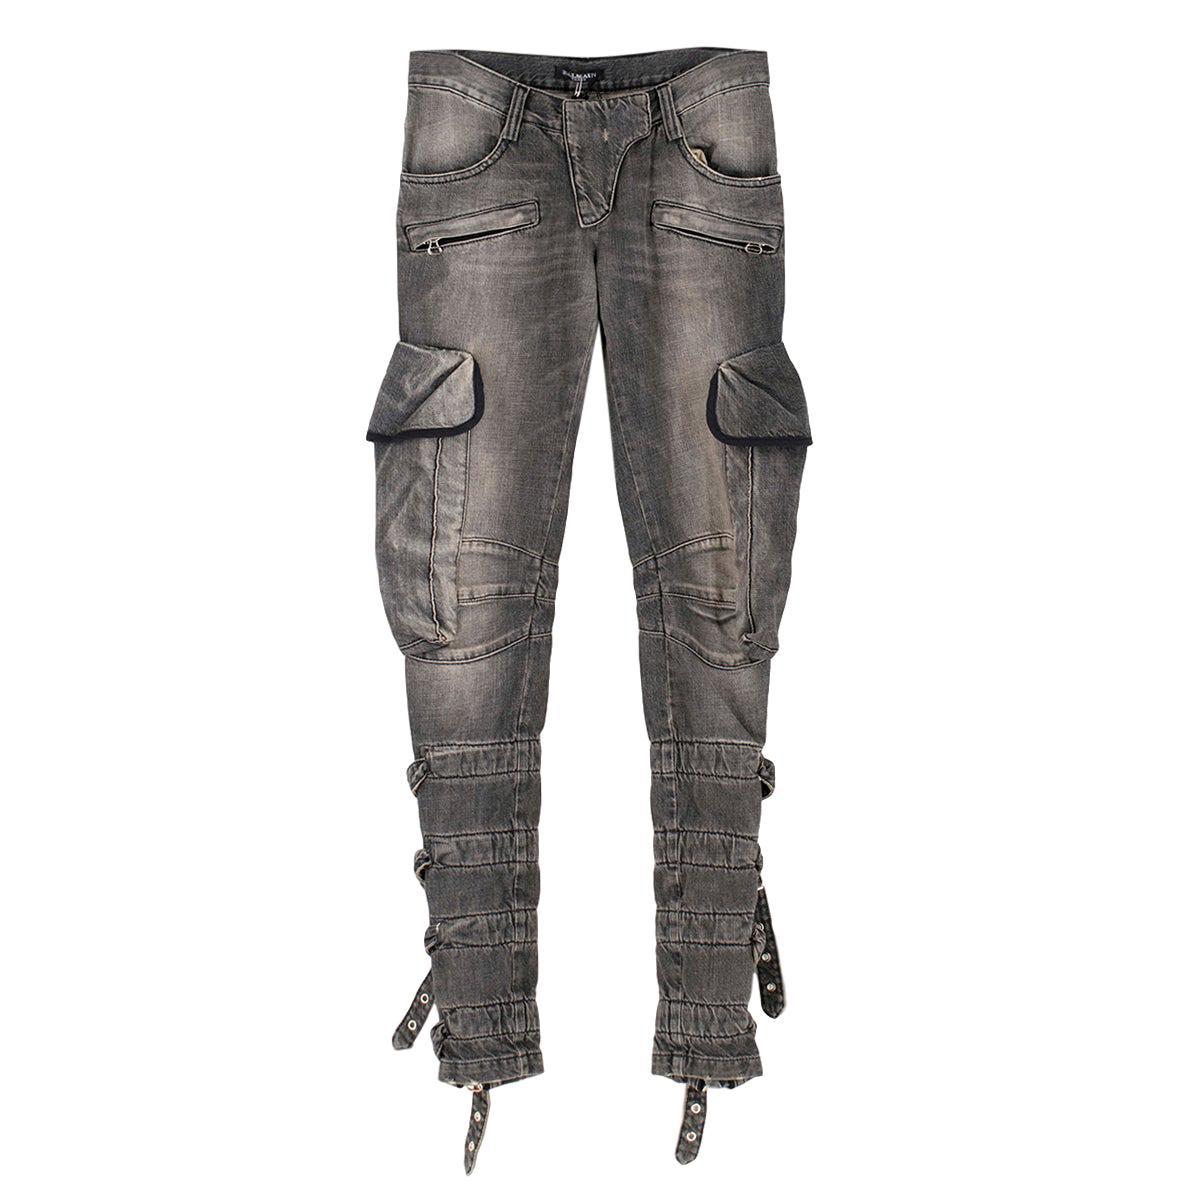 d4e659bcbca BALMAIN hologram effect lambskin leather pants at 1stdibs